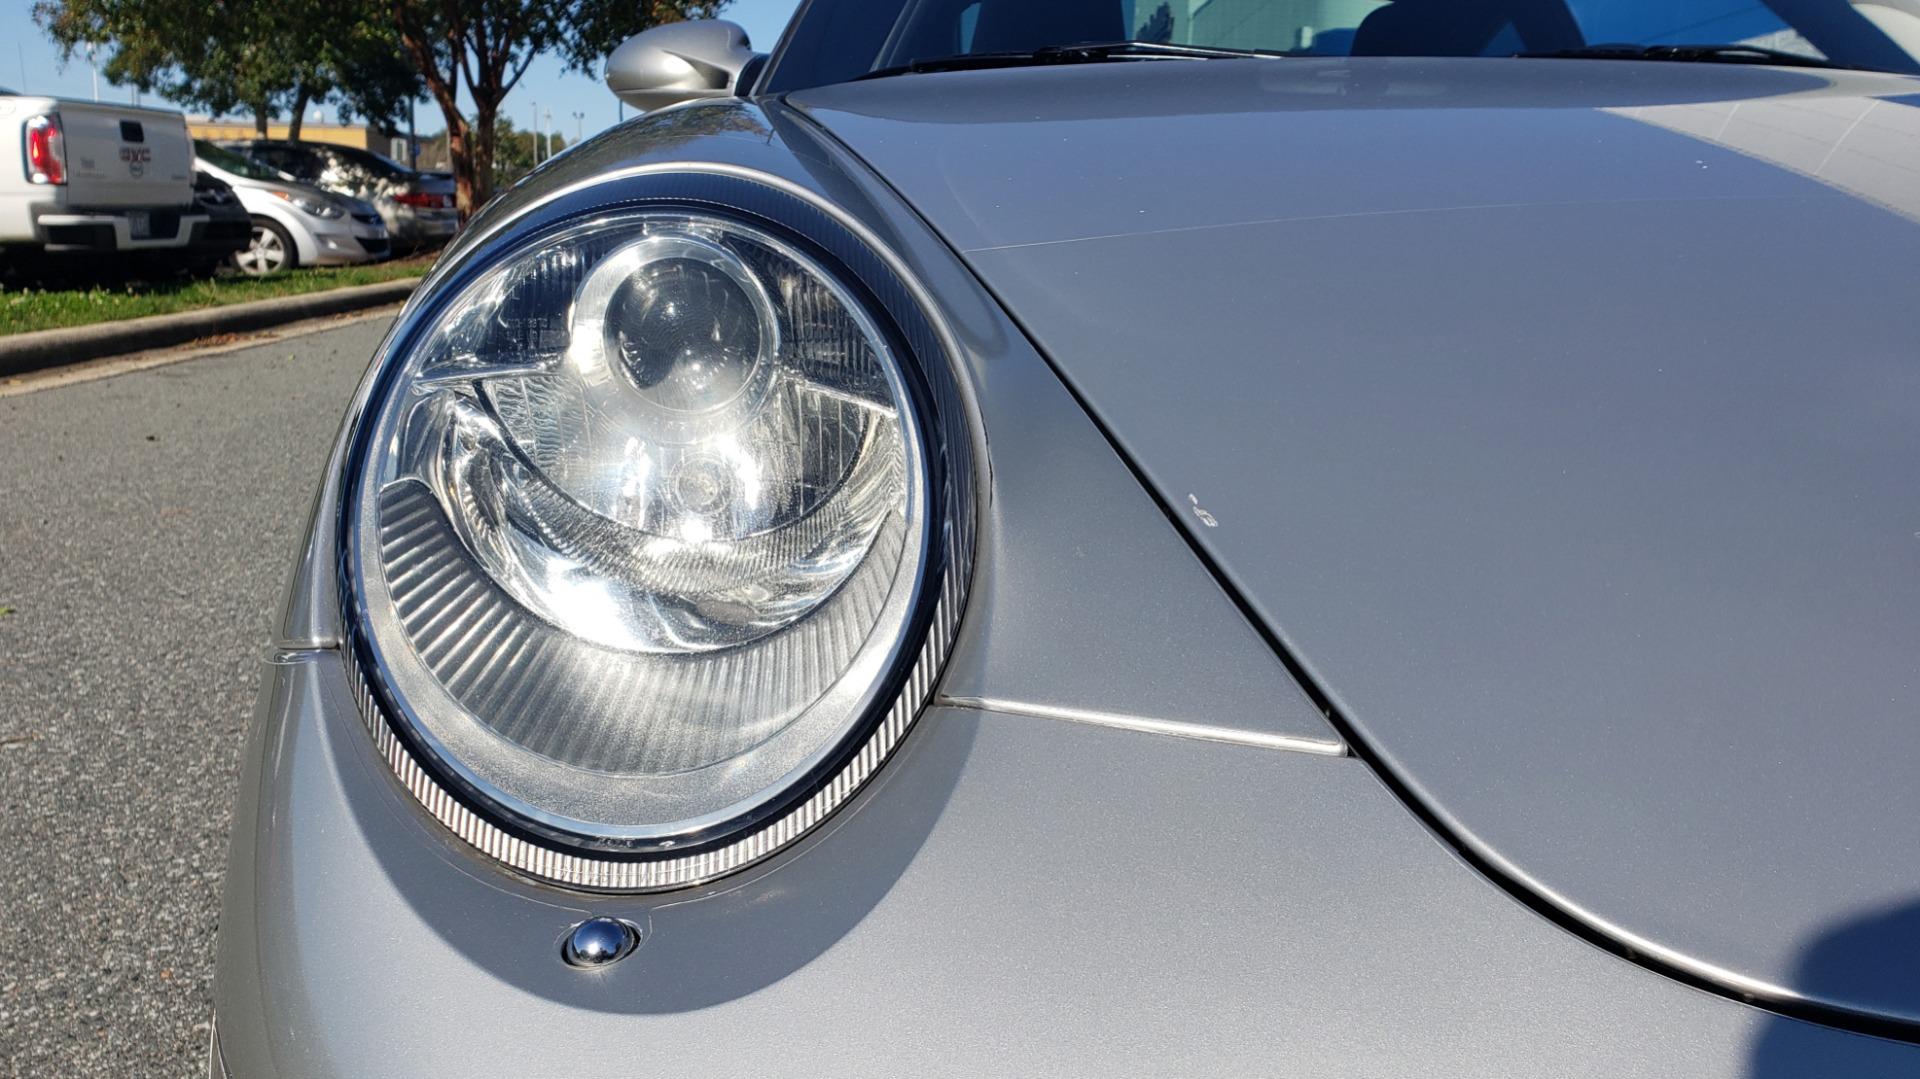 Used 2006 Porsche 911 CARRERA S / 5-SPD AUTO / SPORT CHRONO / NAV / BOSE / SUNROOF for sale Sold at Formula Imports in Charlotte NC 28227 12